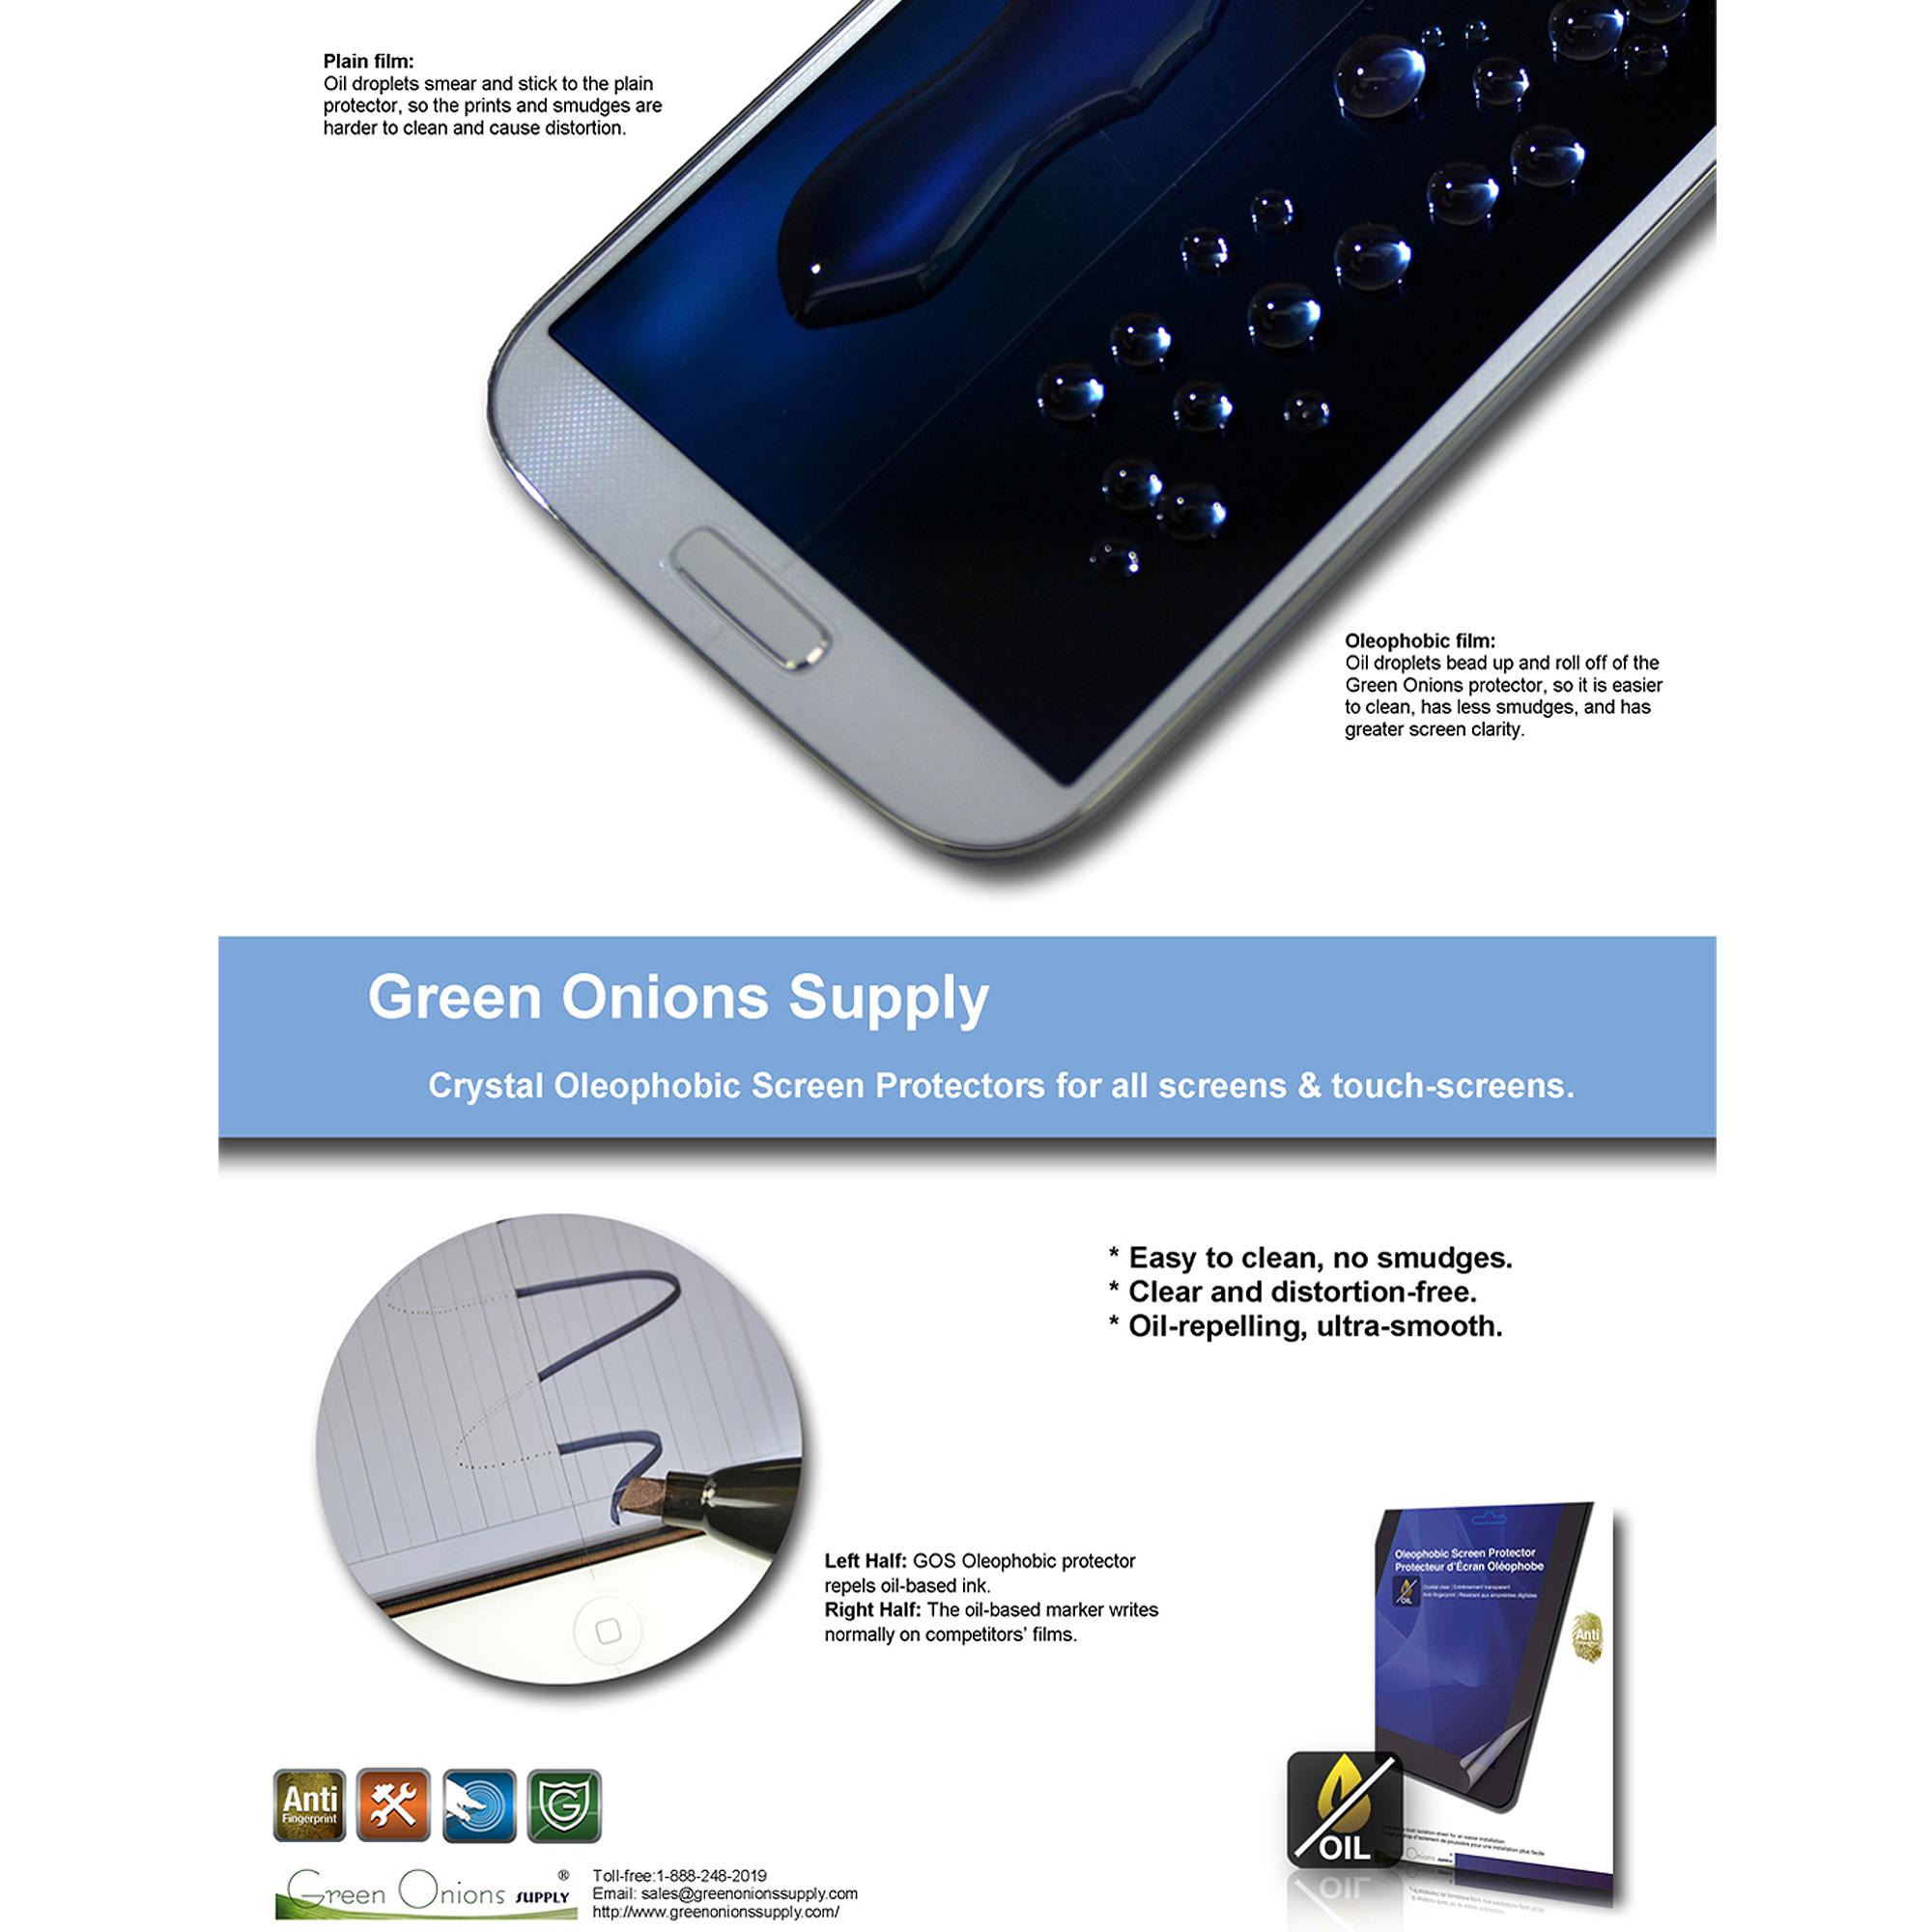 Crystal Oleophobic Screen Protector for BlackBerry Z30 Smartphone, 2pk